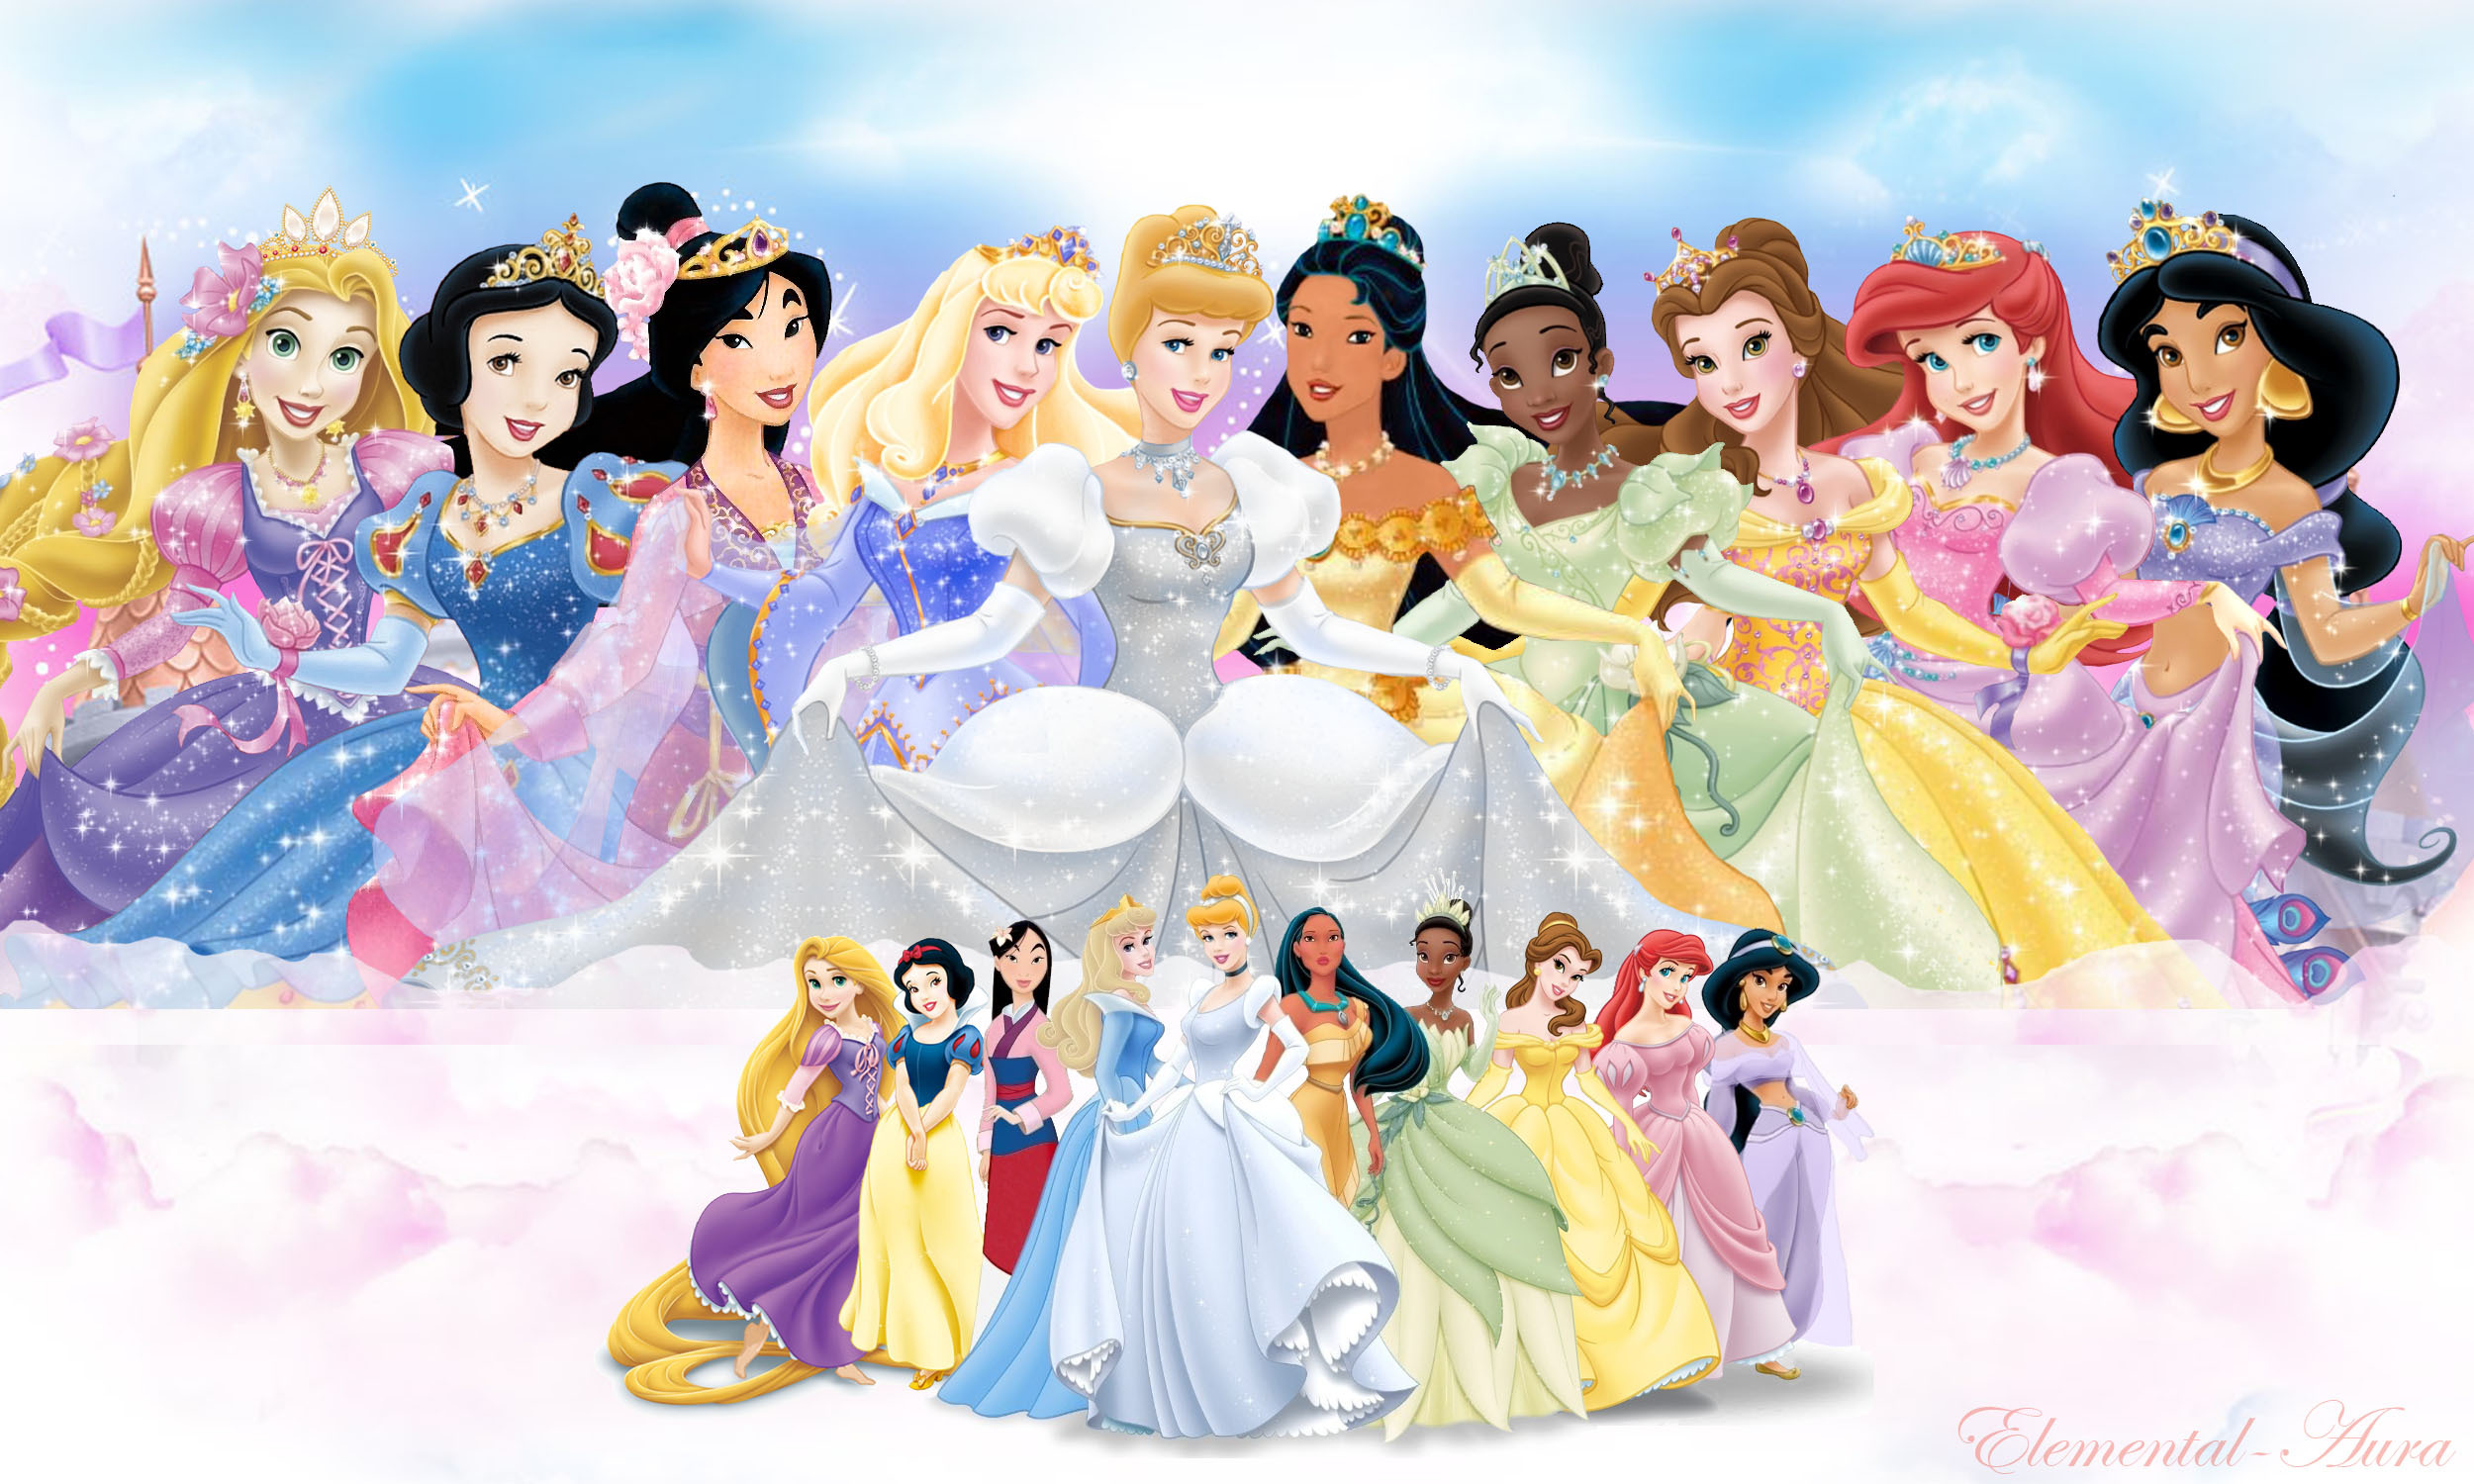 Disney Characters Wallpaper HD wallpaper background